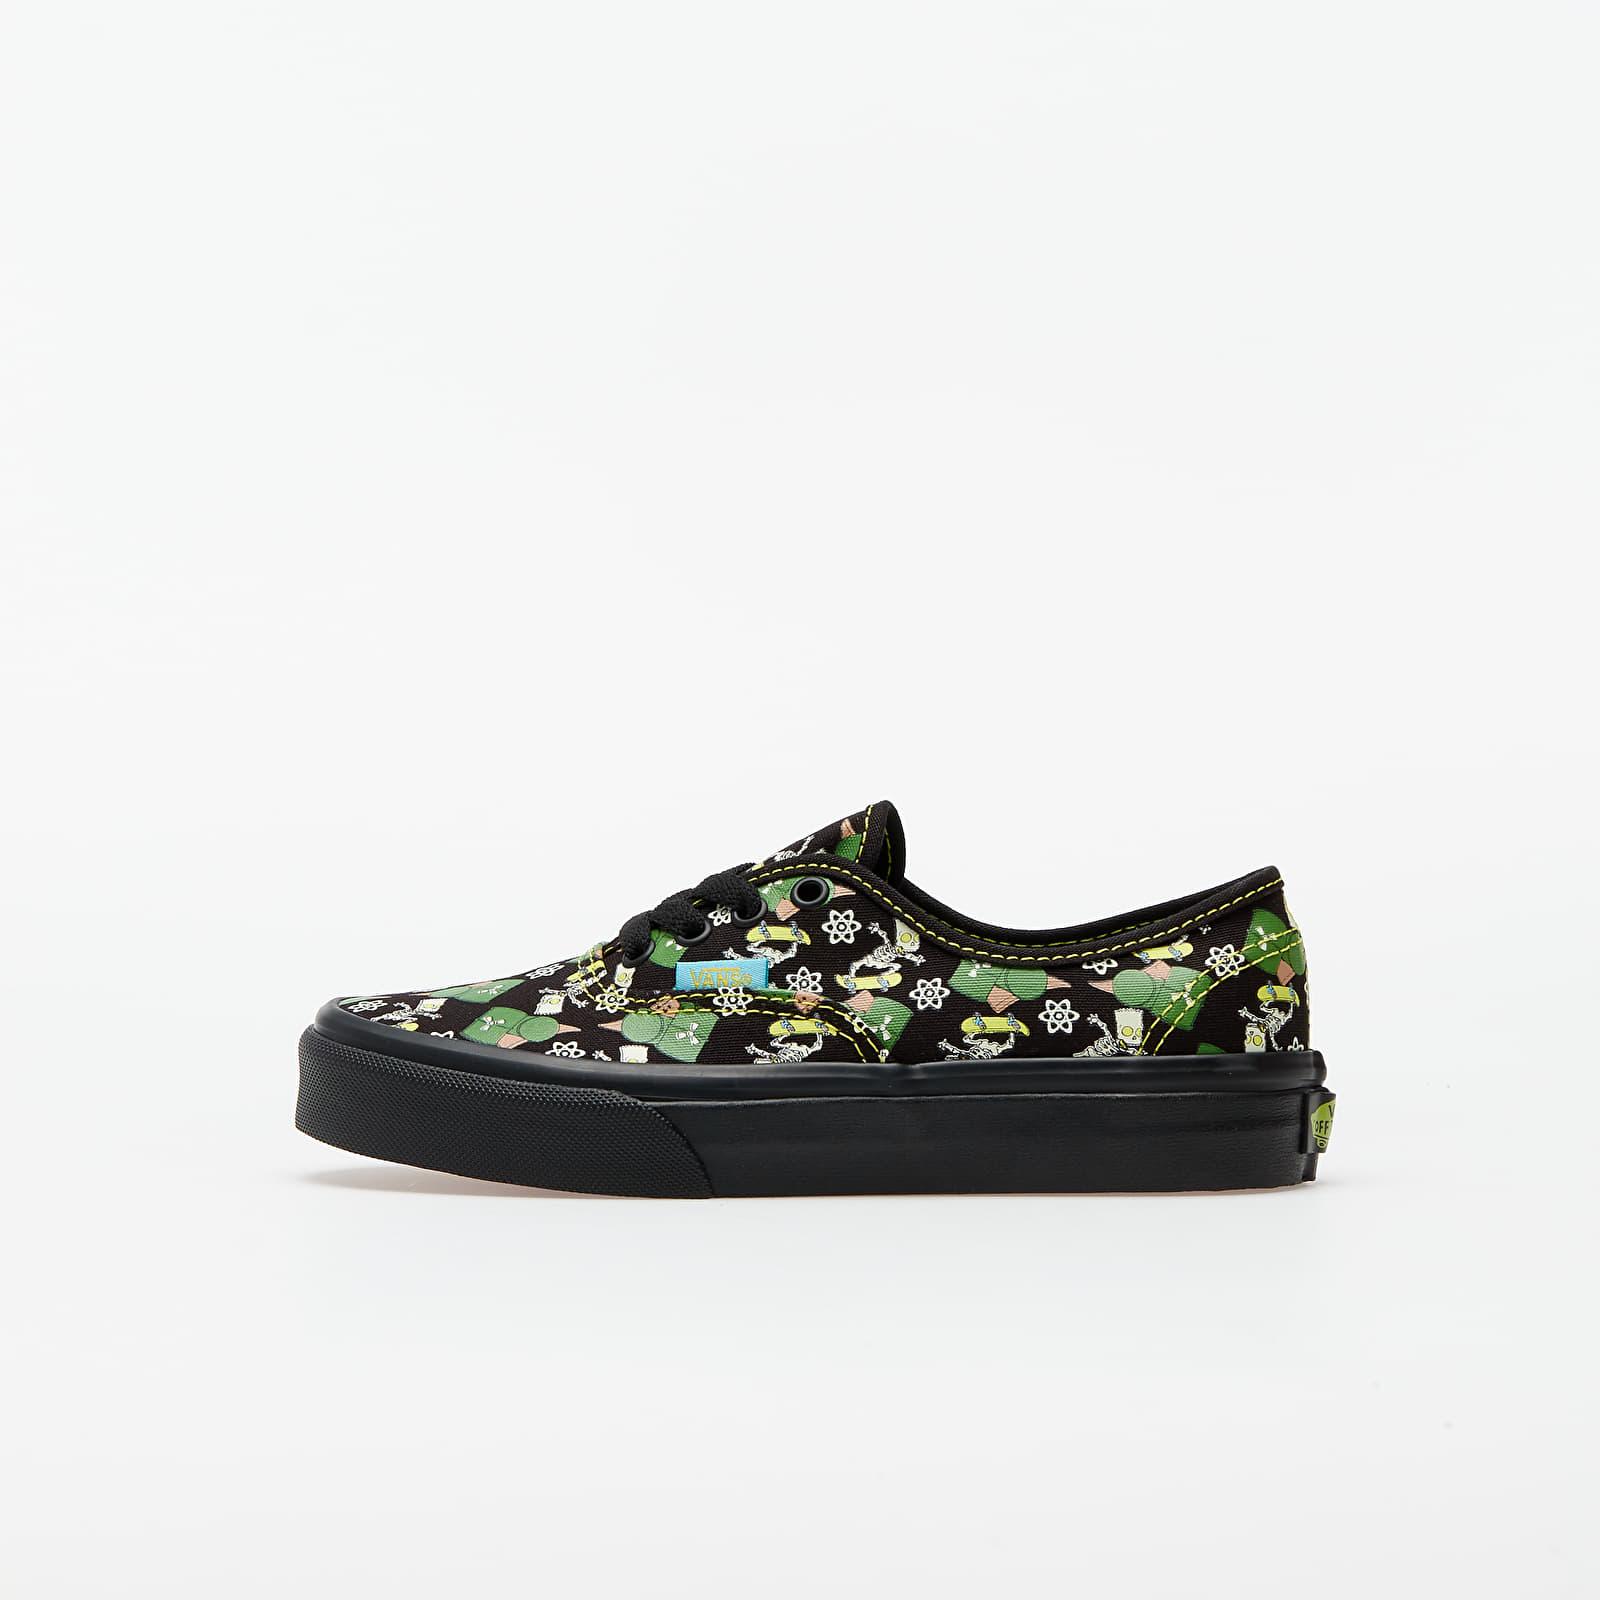 Dětské tenisky a boty Vans Authentic (The Simpsons) Glow Bart